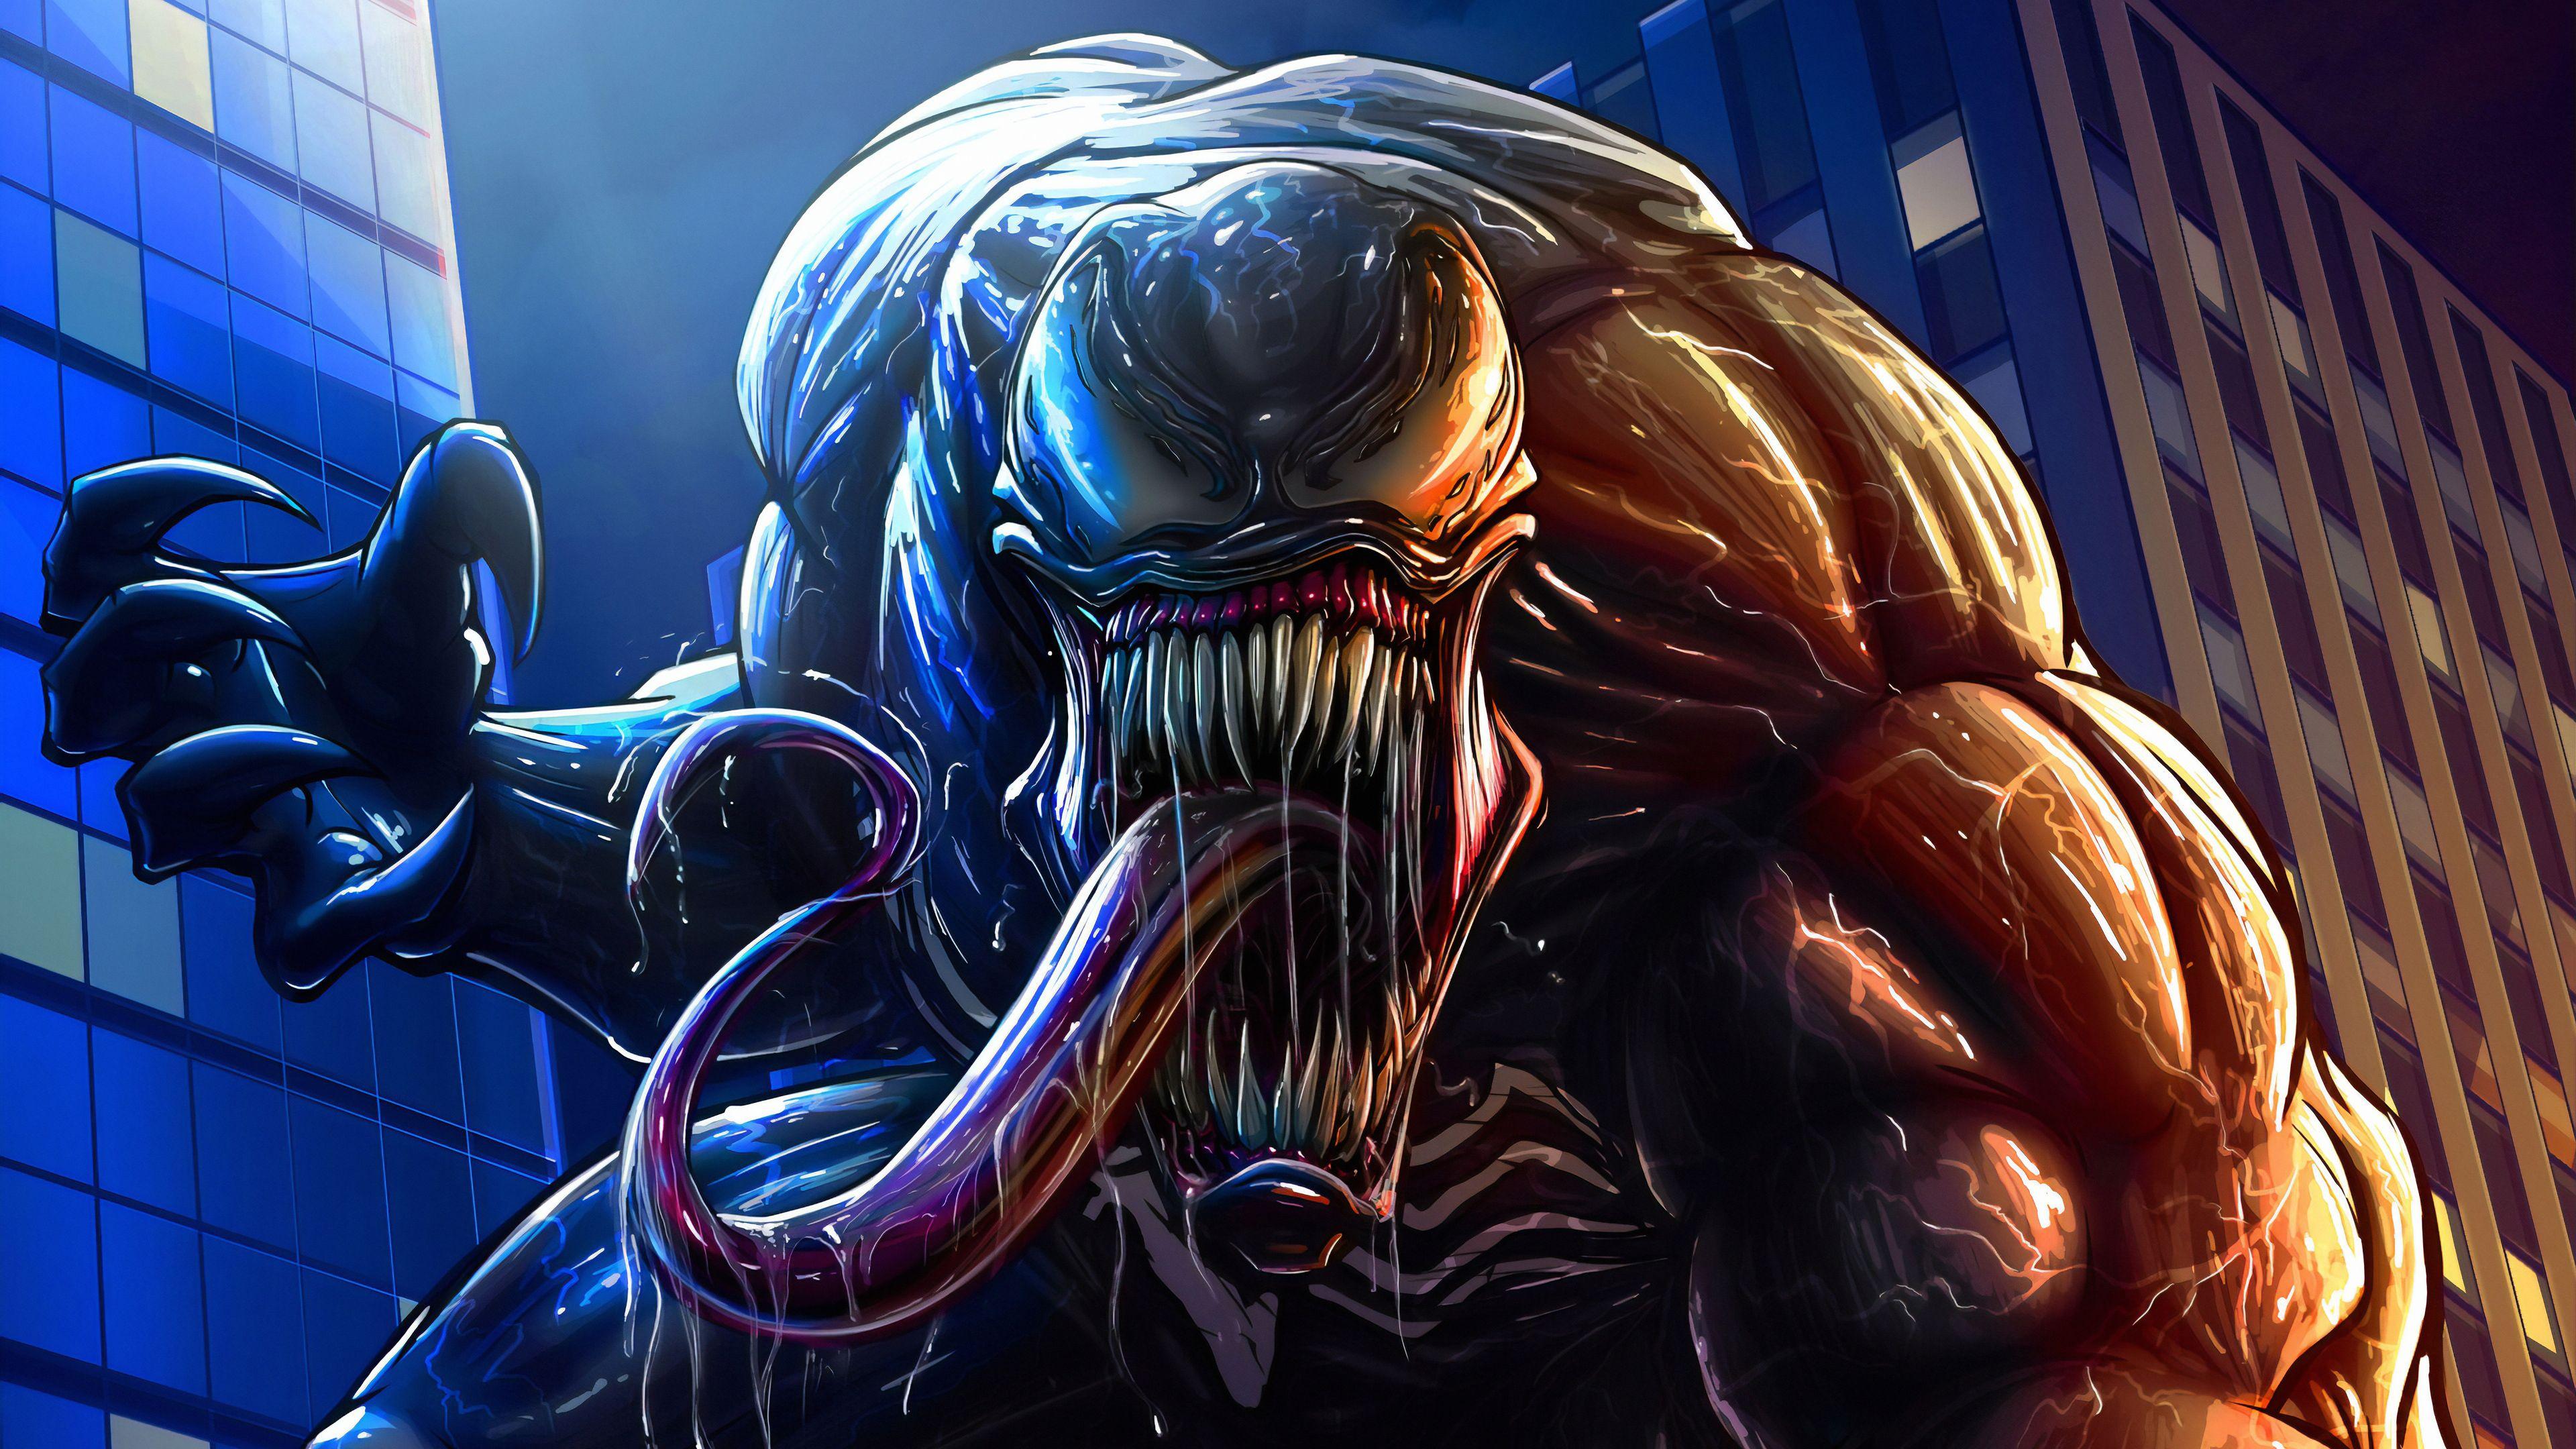 Venom 2 4K Art Wallpapers - Wallpaper Cave